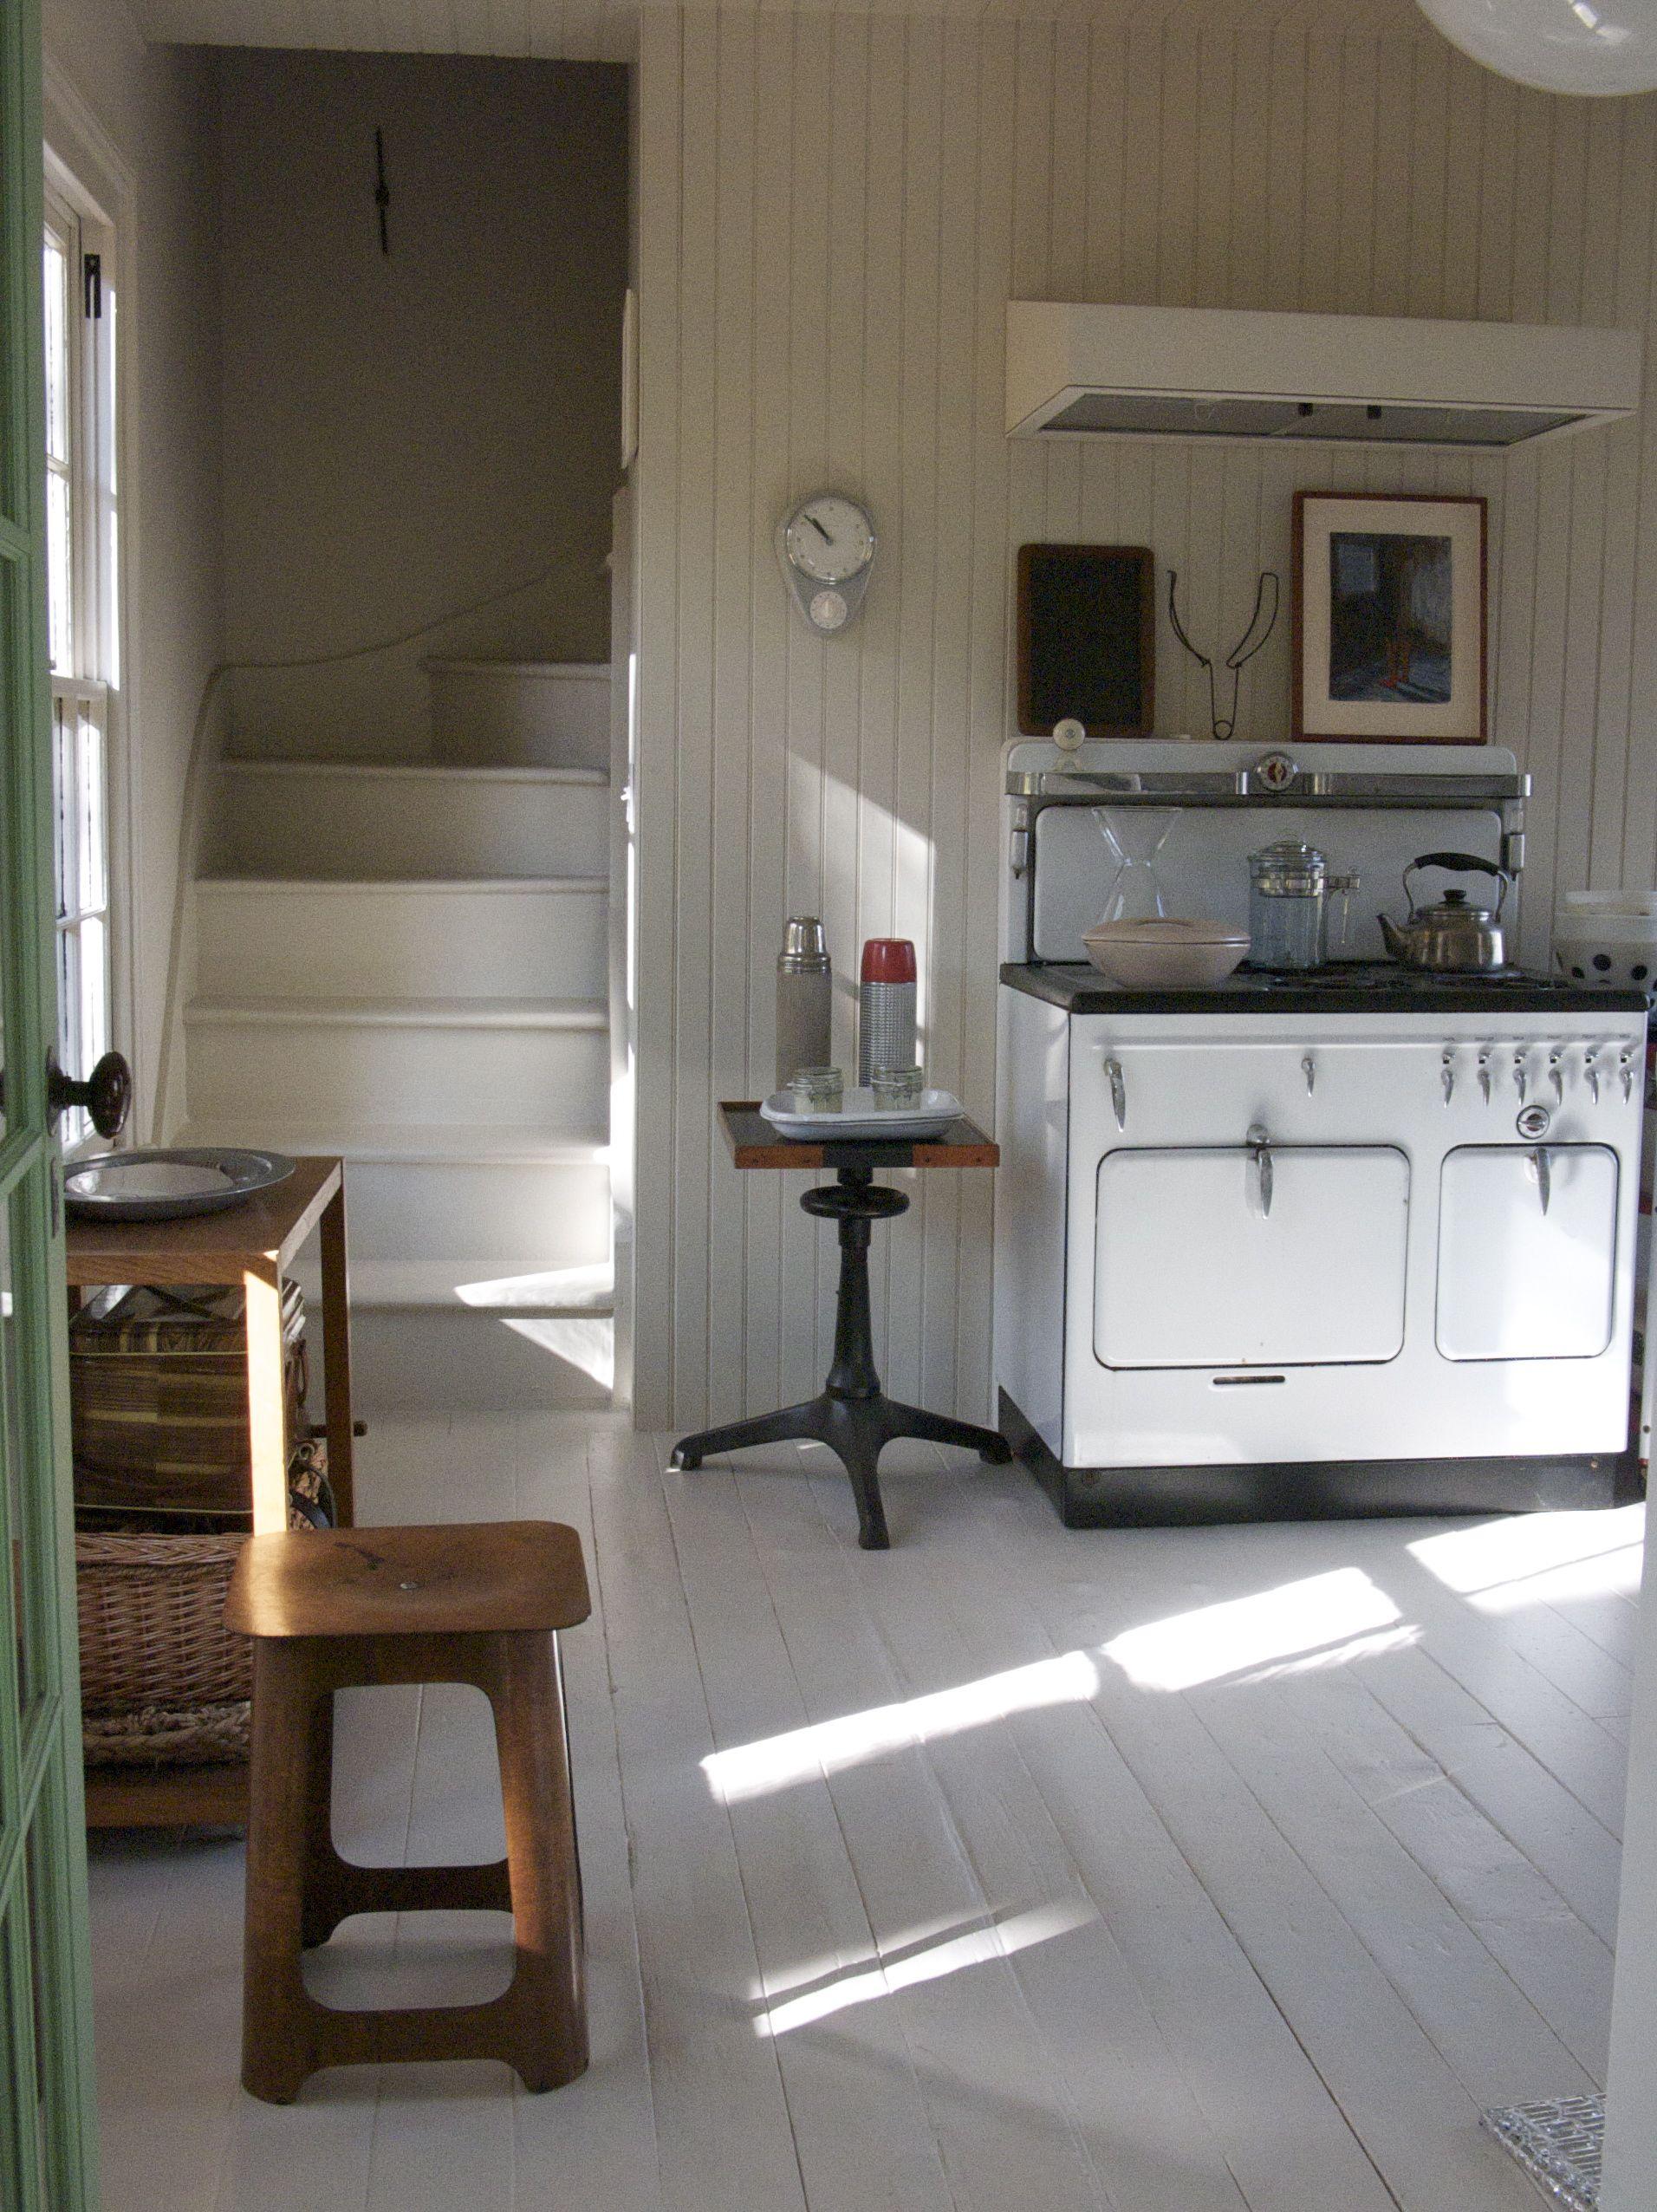 Farmhouse kitchen t slc assorted inspiration pinterest